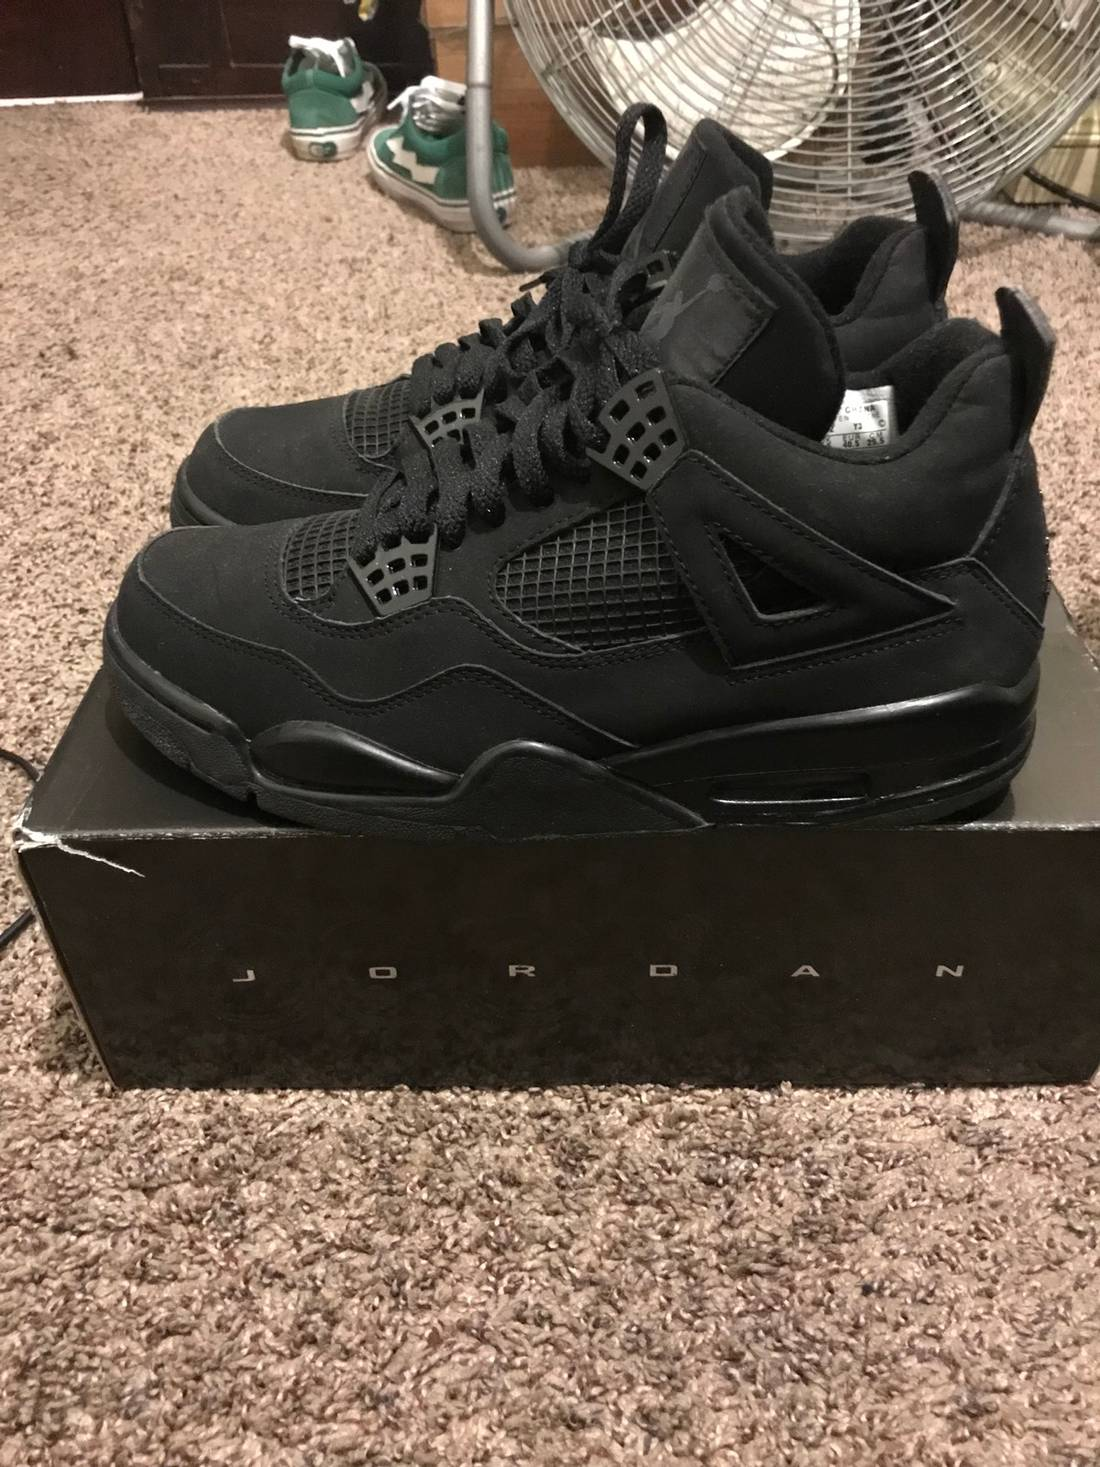 5f812e9e8cbe ... Sneaker Bar Detroit  Air Jordan 4 Black Cat Review On Foot You ...